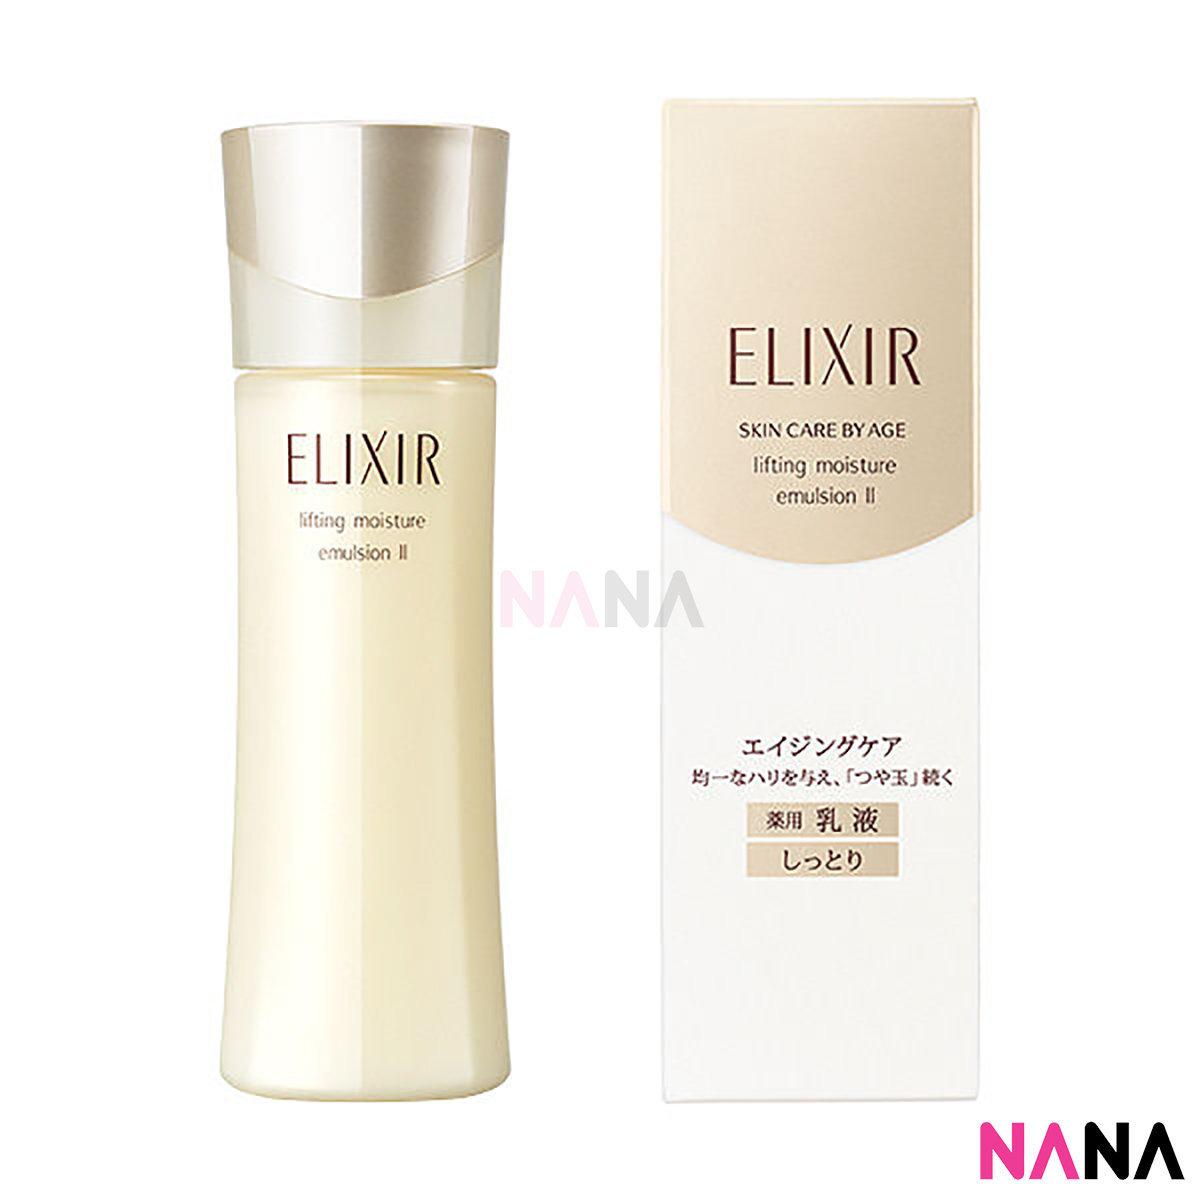 Elixir Skin Care By Age Lifting Moisture Emulsion II 130ml